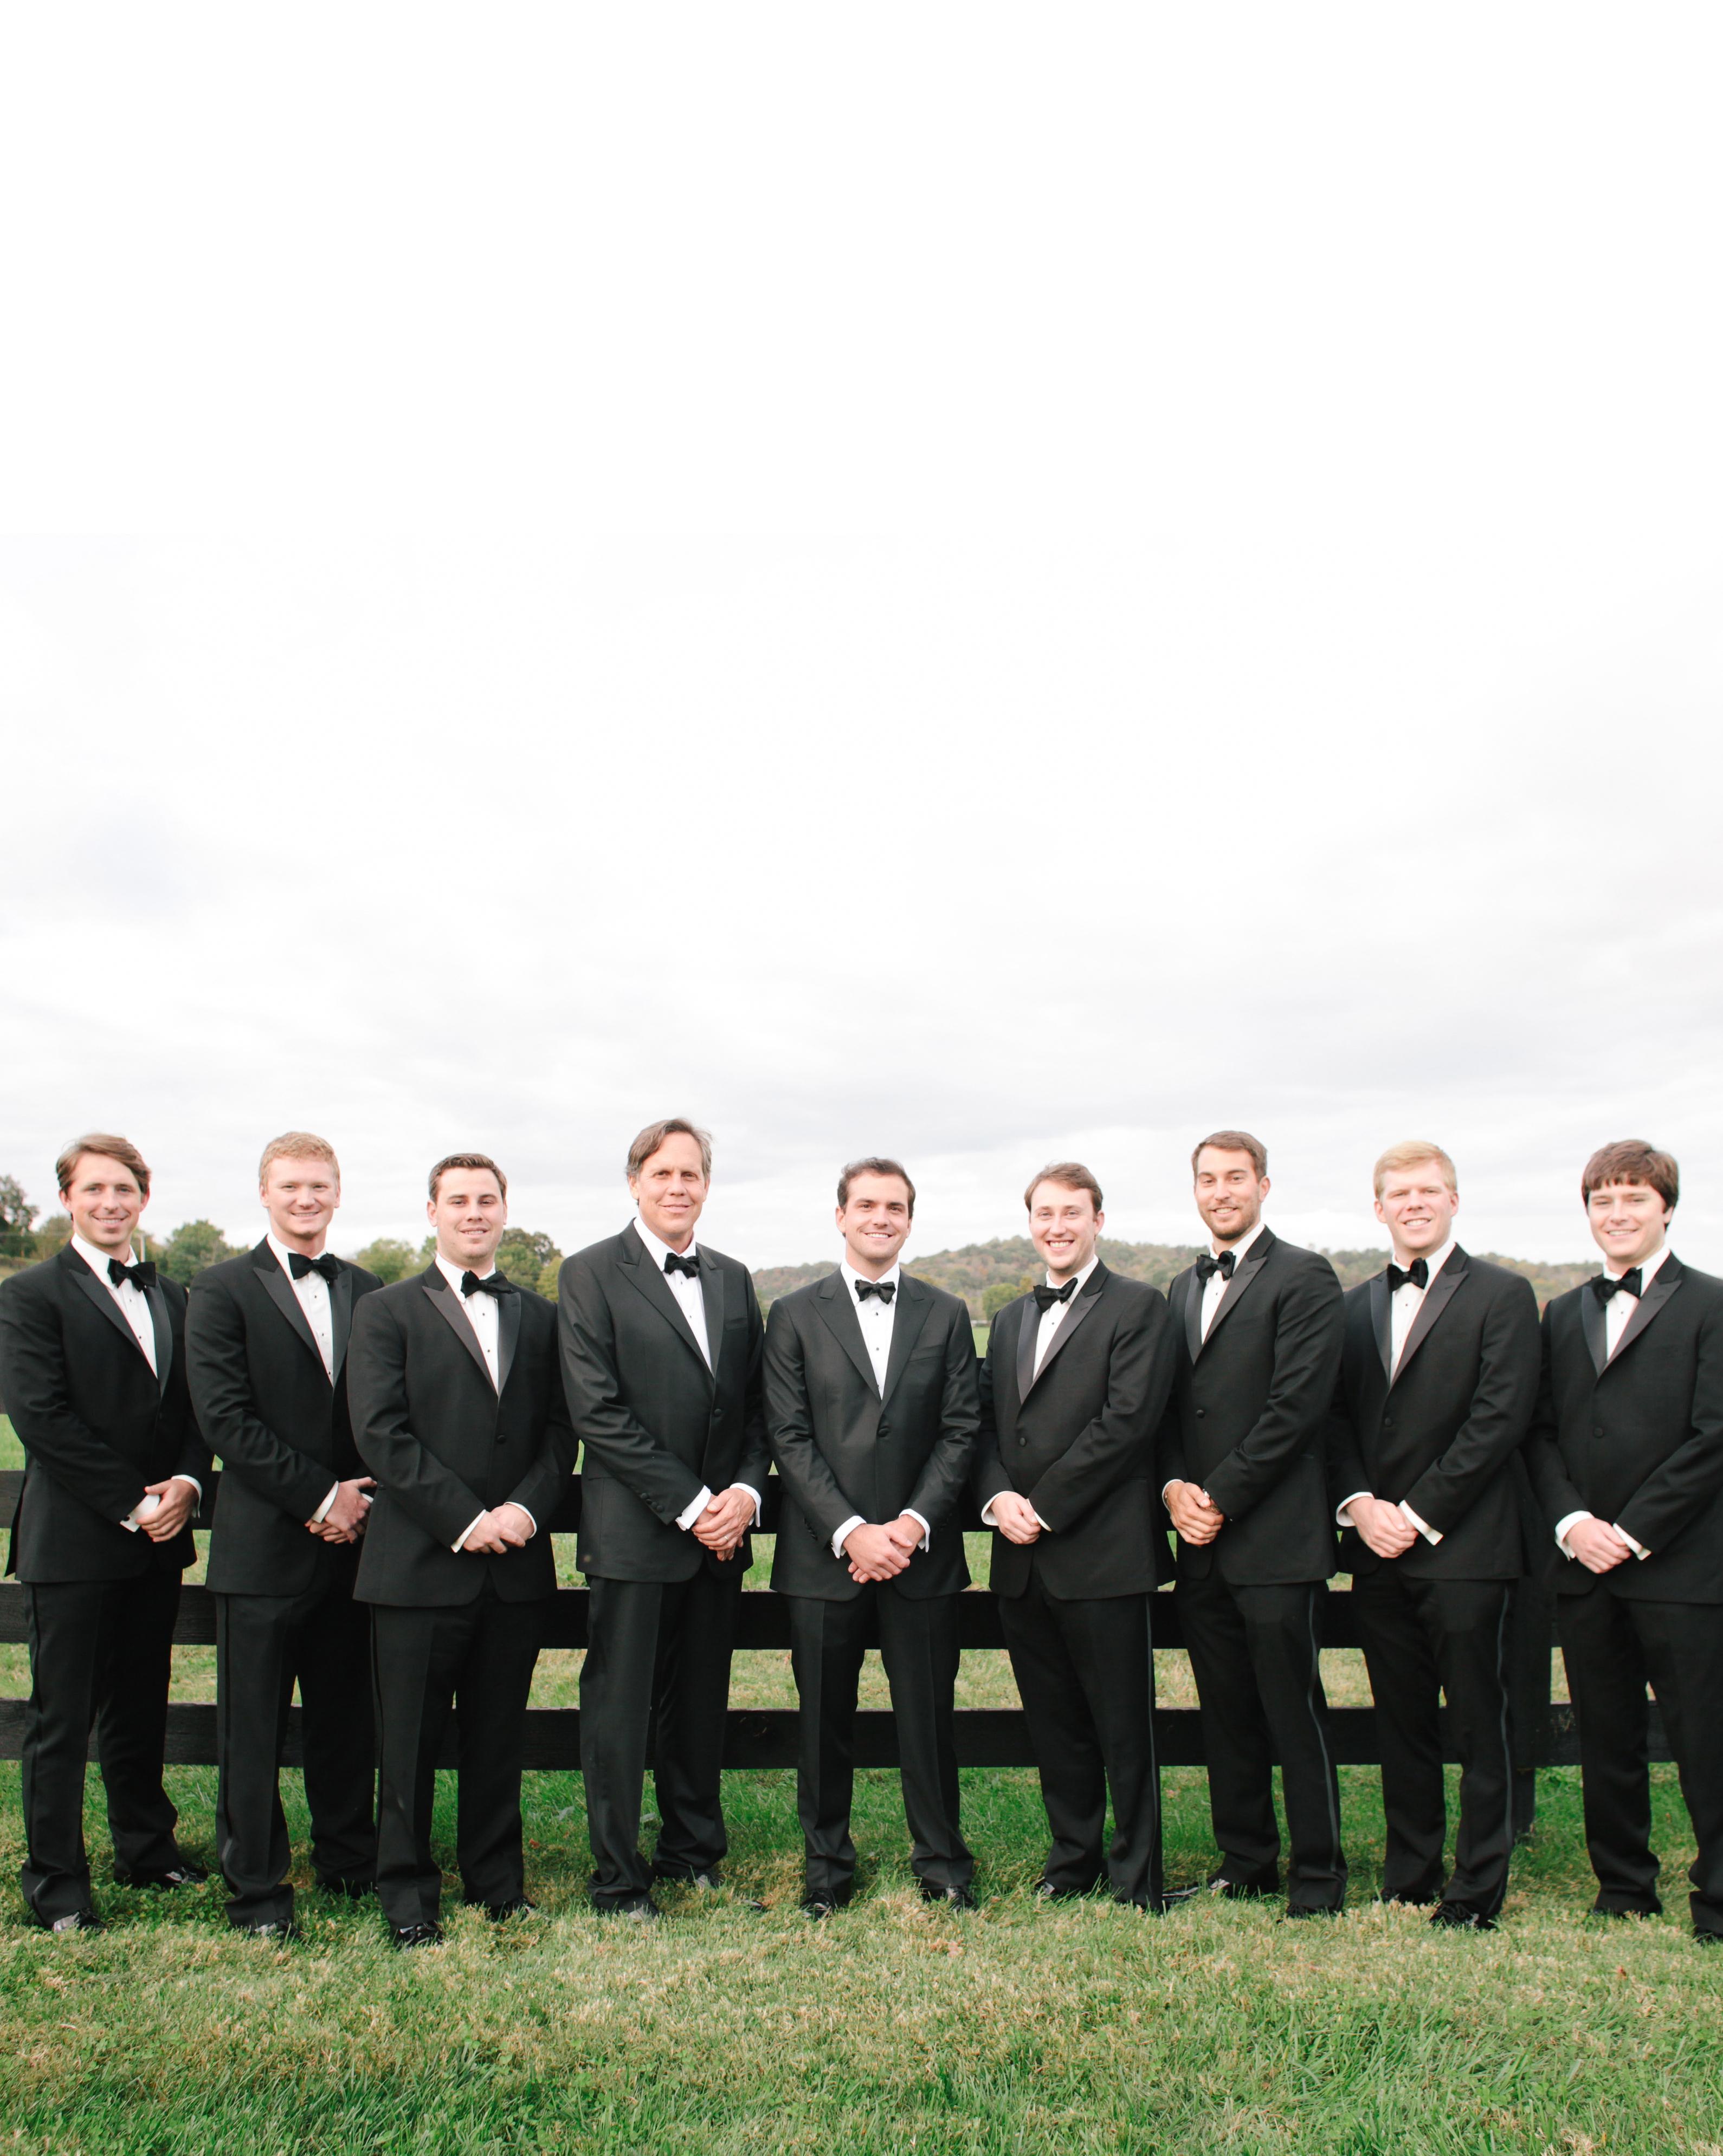 destiny-taylor-wedding-groomsmen-256-s112347-1115.jpg